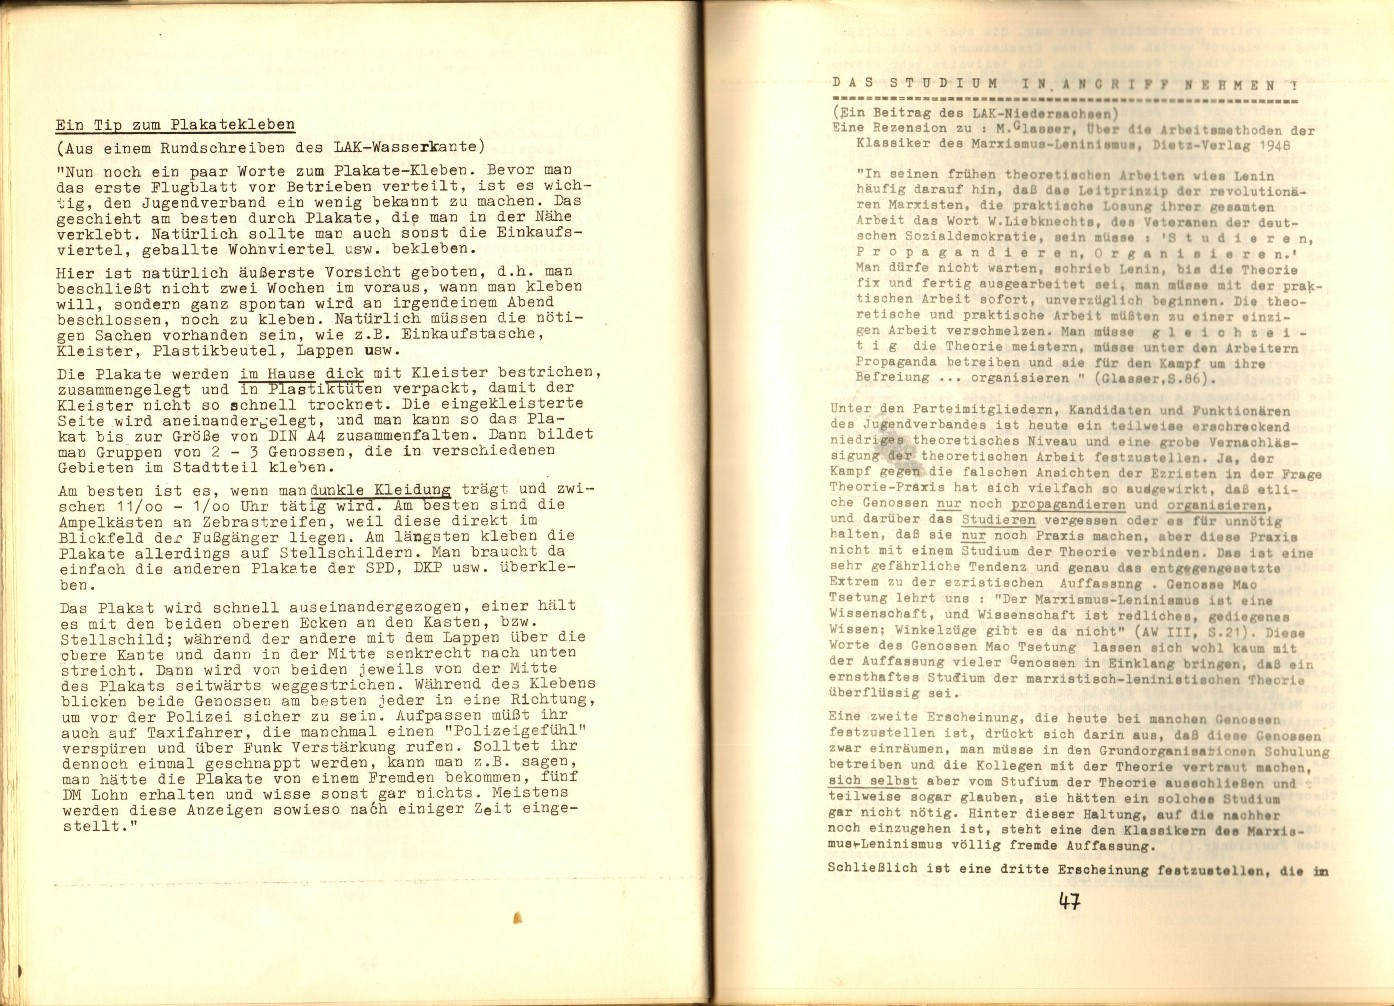 ZB_Parteiarbeiter_1970_03_28